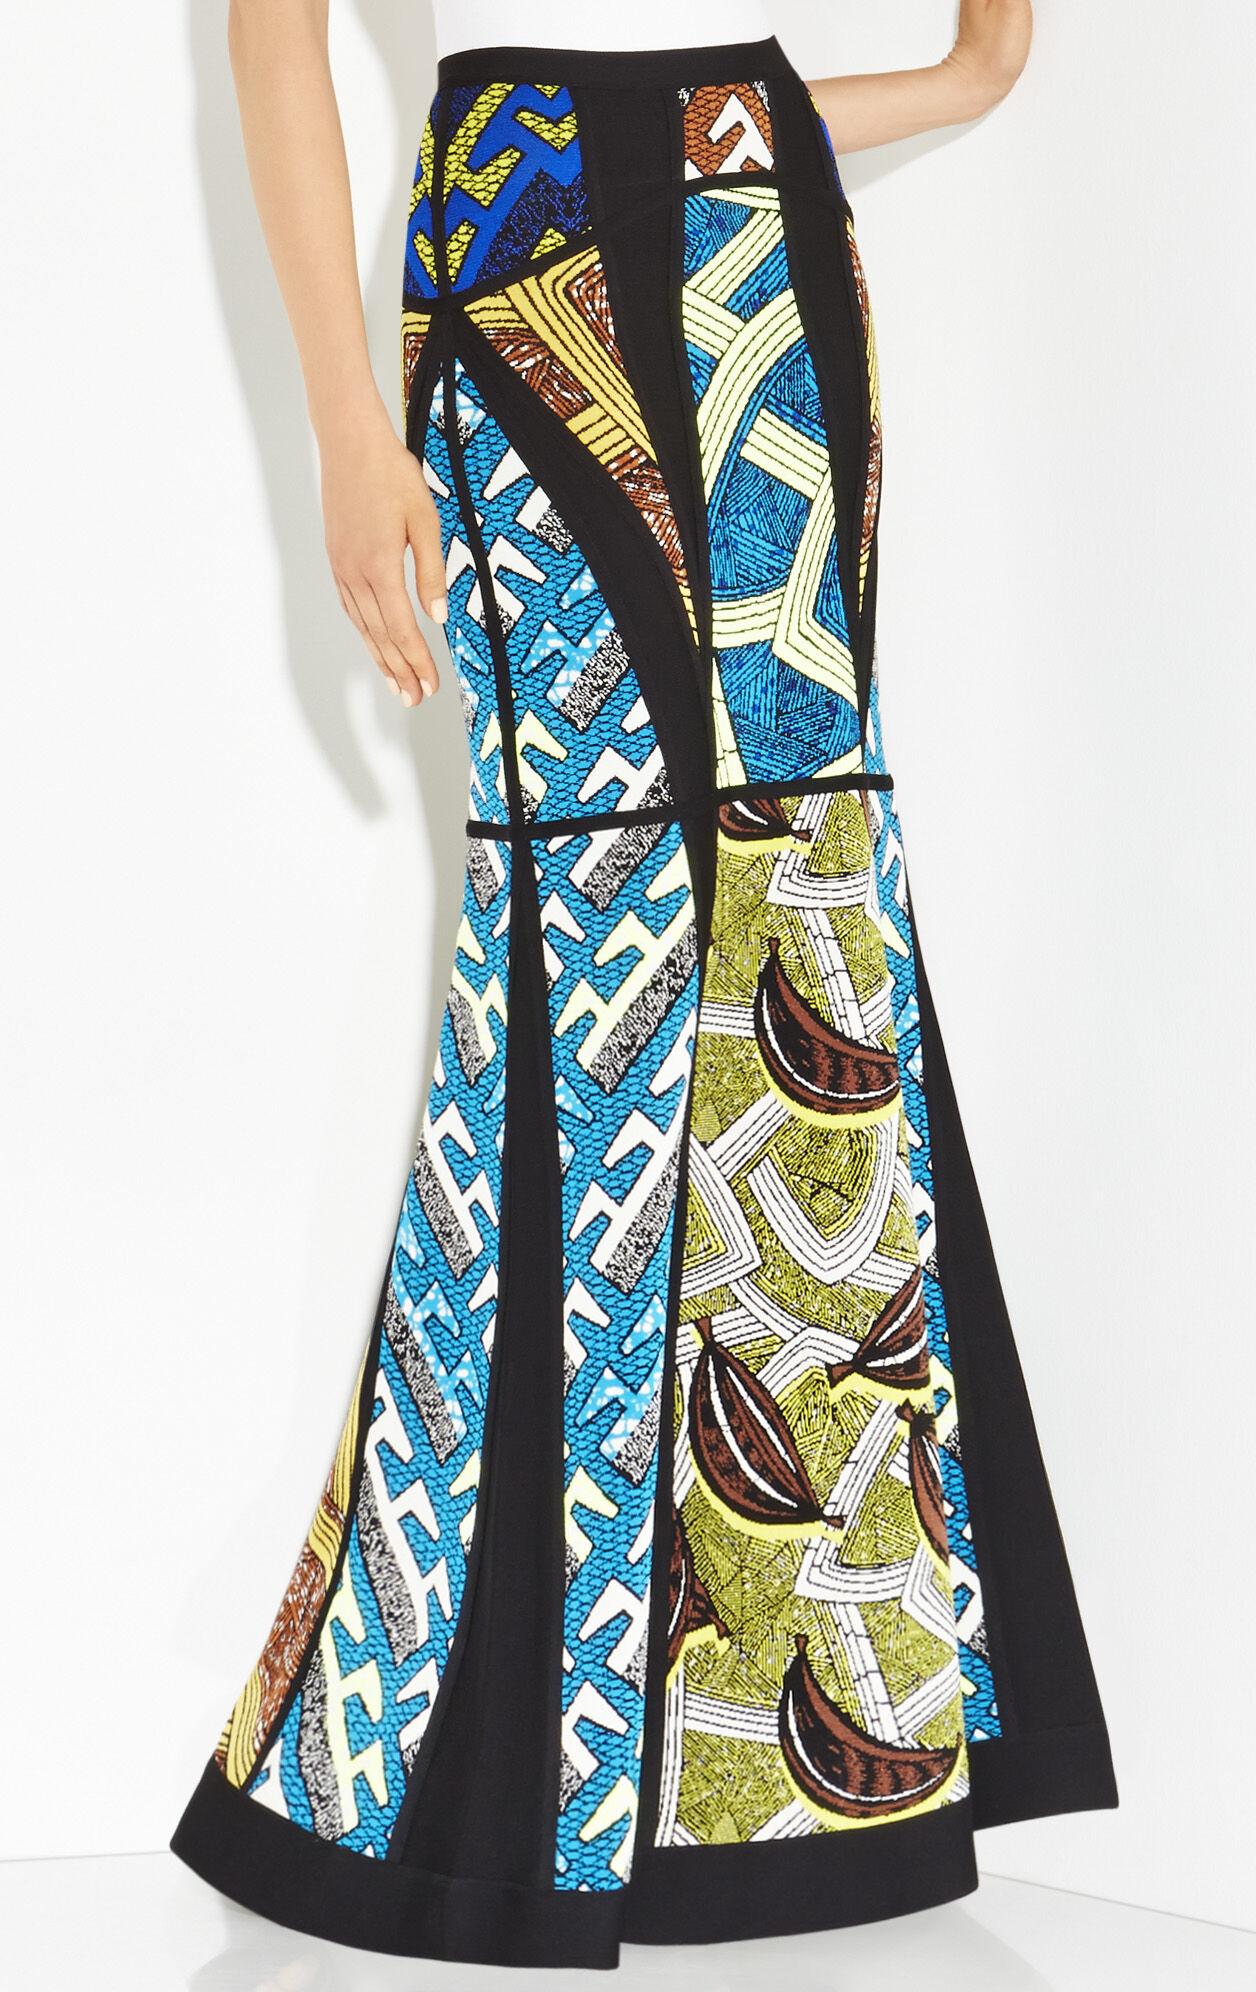 Nolena Tribal Jacquard Skirt